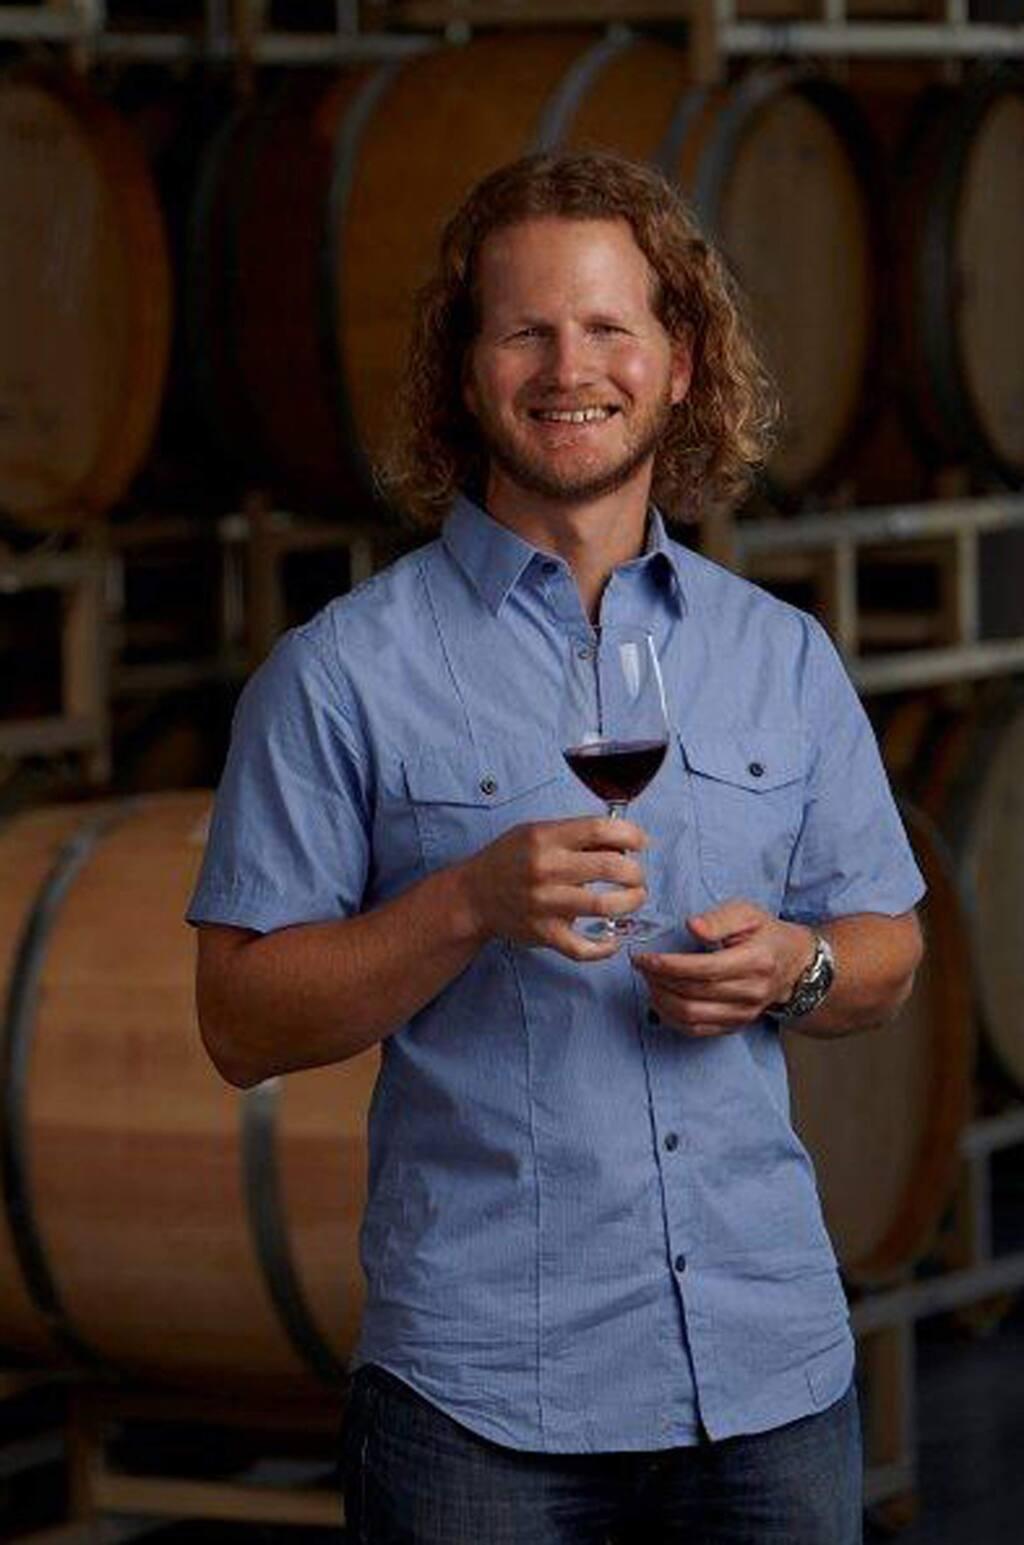 Joe Freeman, winemaker at River Road Family Vineyards & Winery in Sebastopol. (River Road Family Vineyards & Winery)